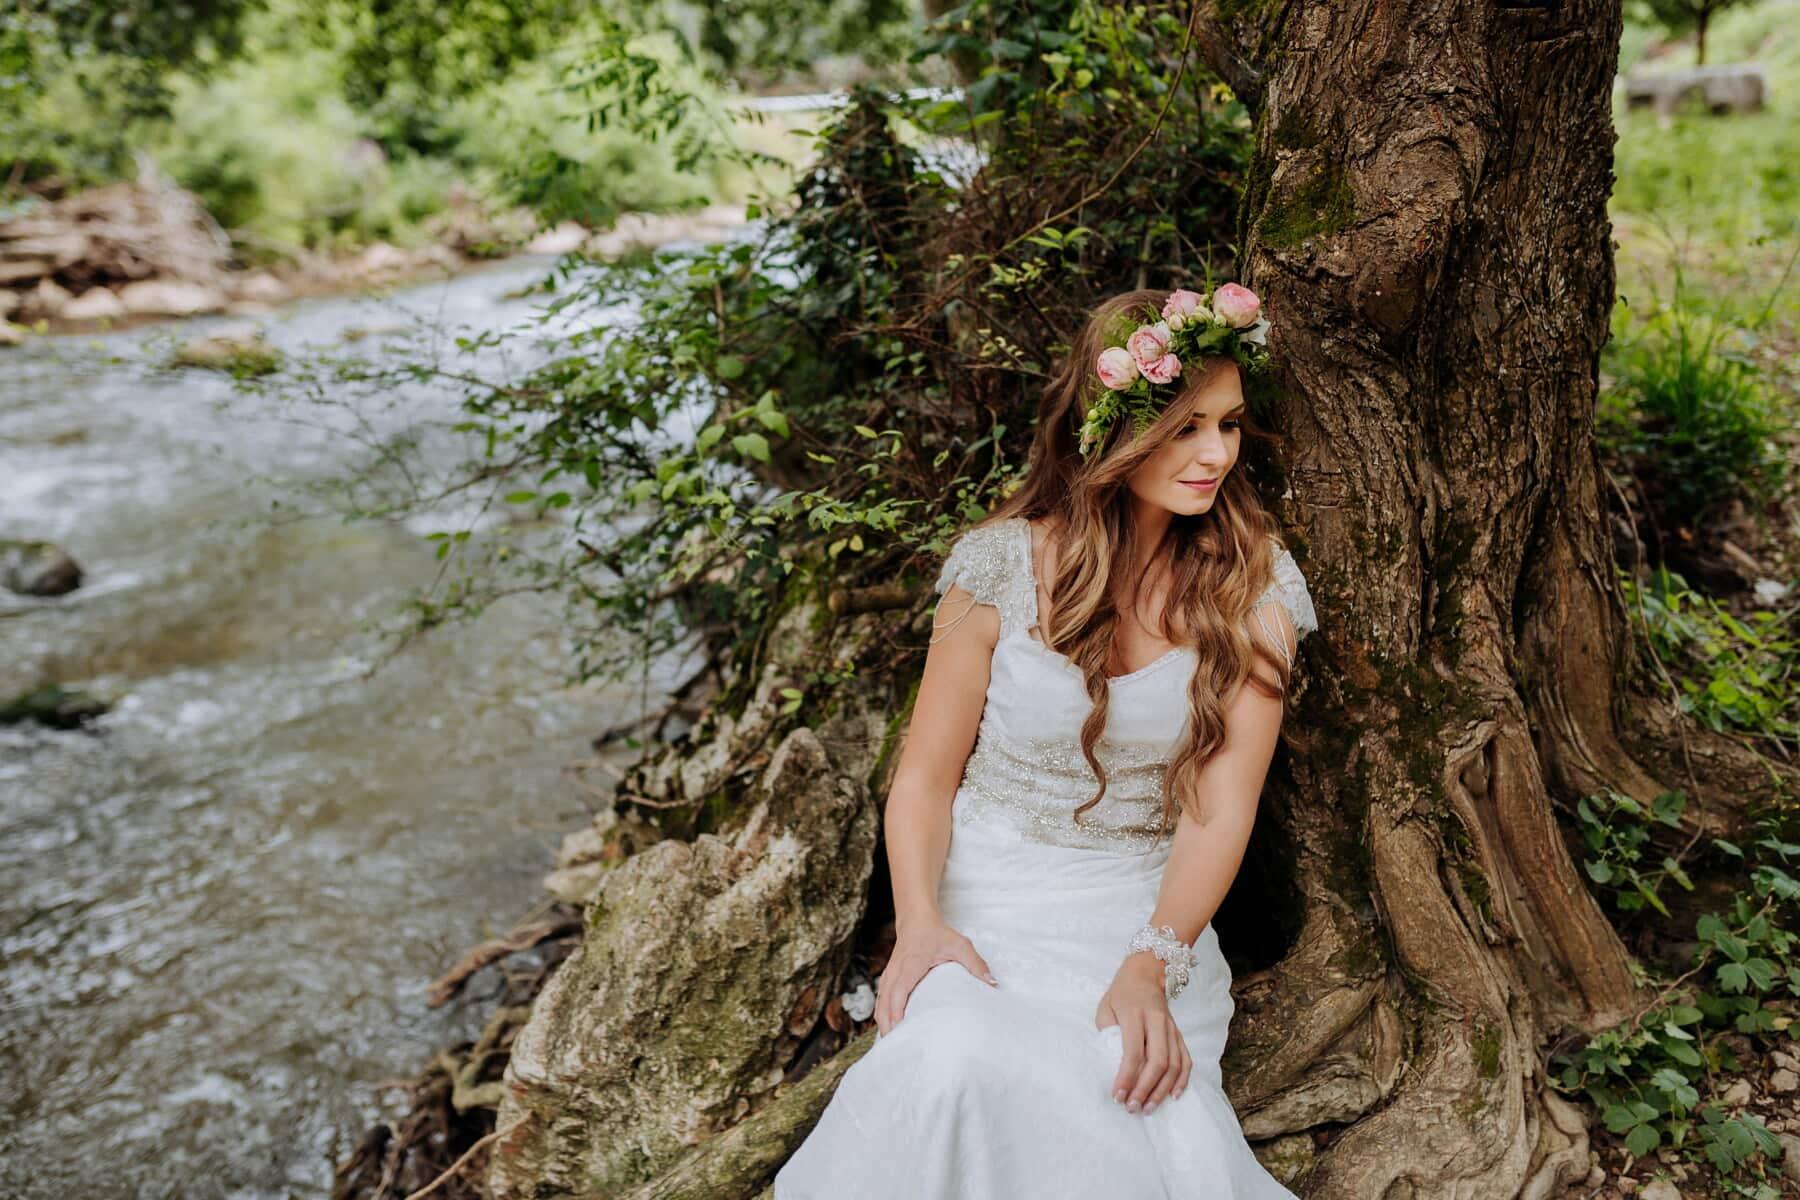 goddess, beauty, pretty girl, nymph, bride, dress, girl, wood, tree, portrait